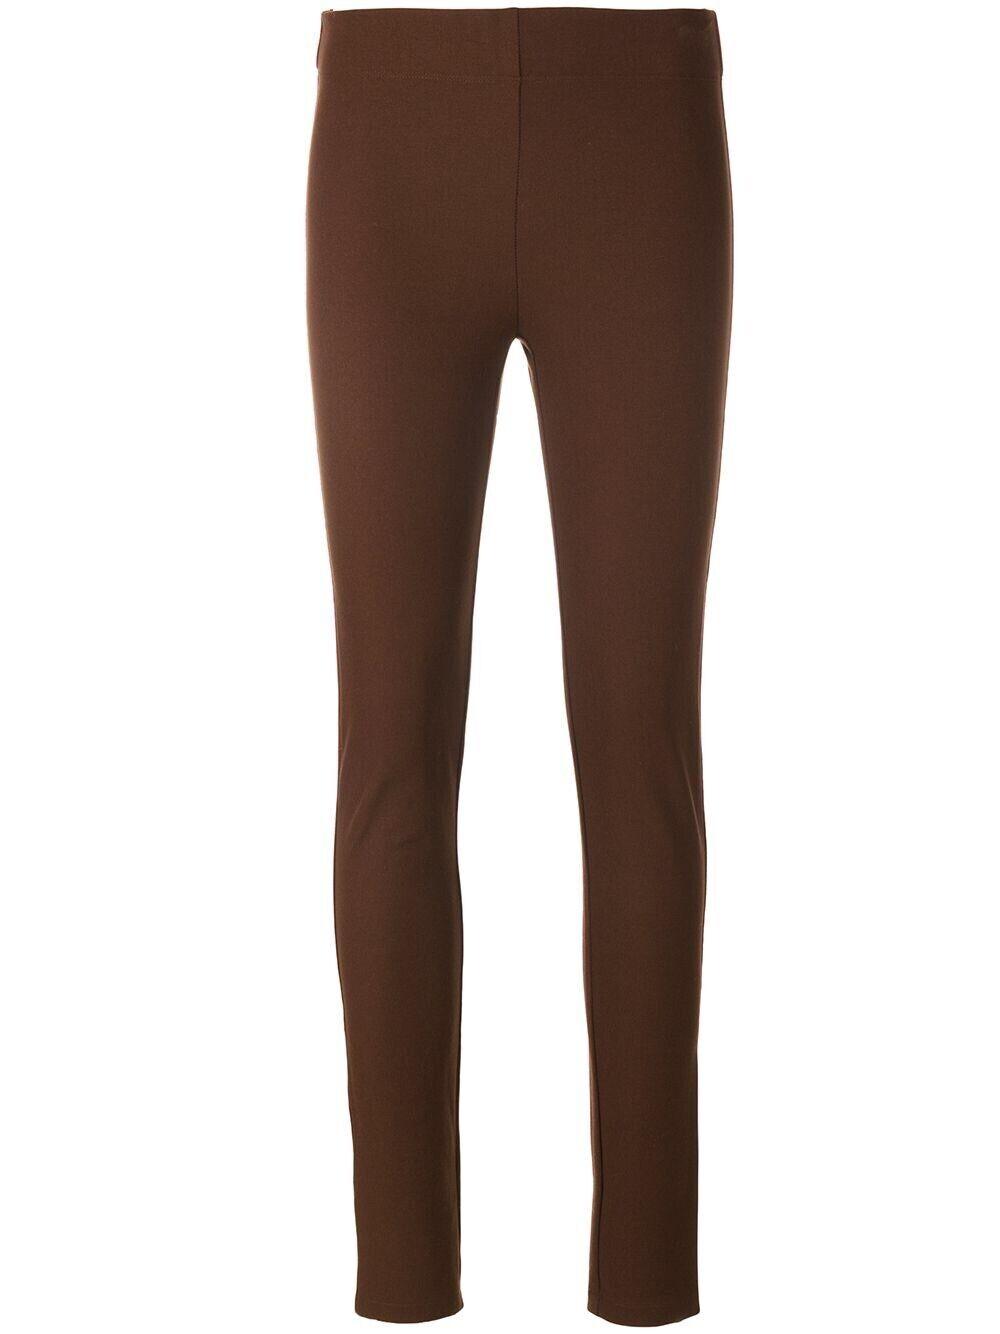 New JOSEPH Slim Fit Leggings Size 34 MSRP